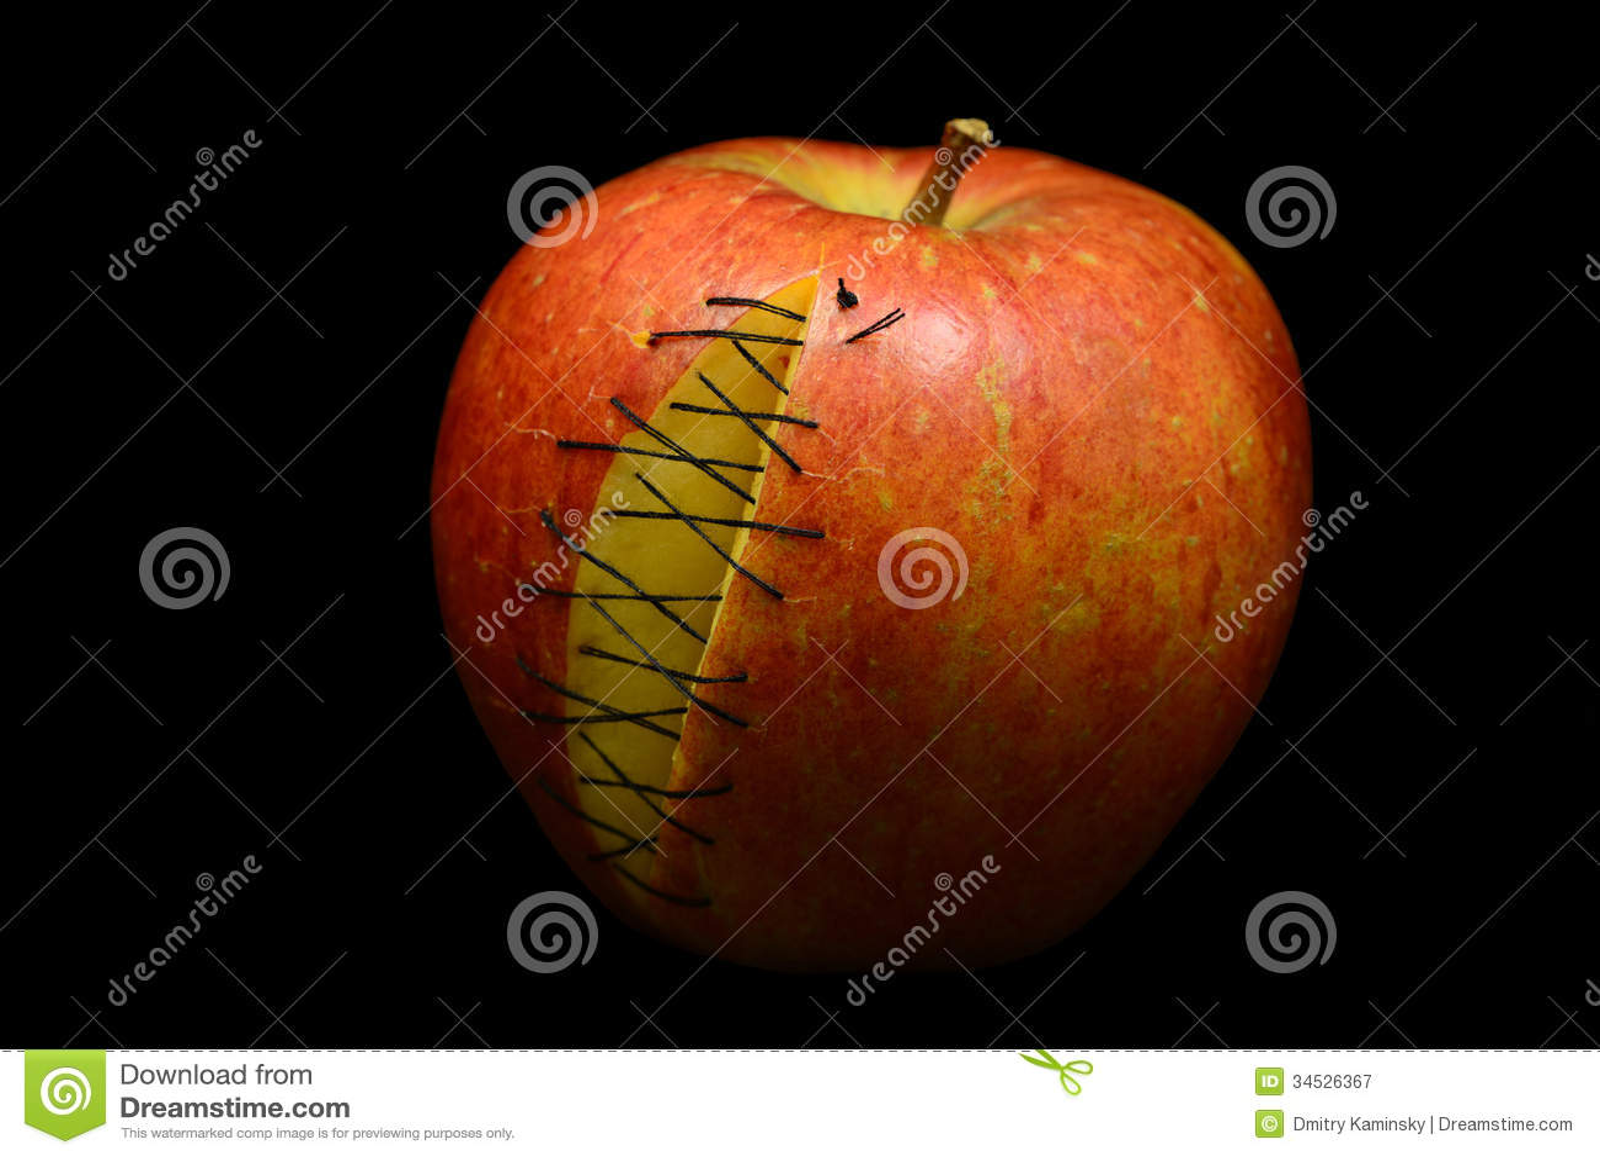 Apple met littekens